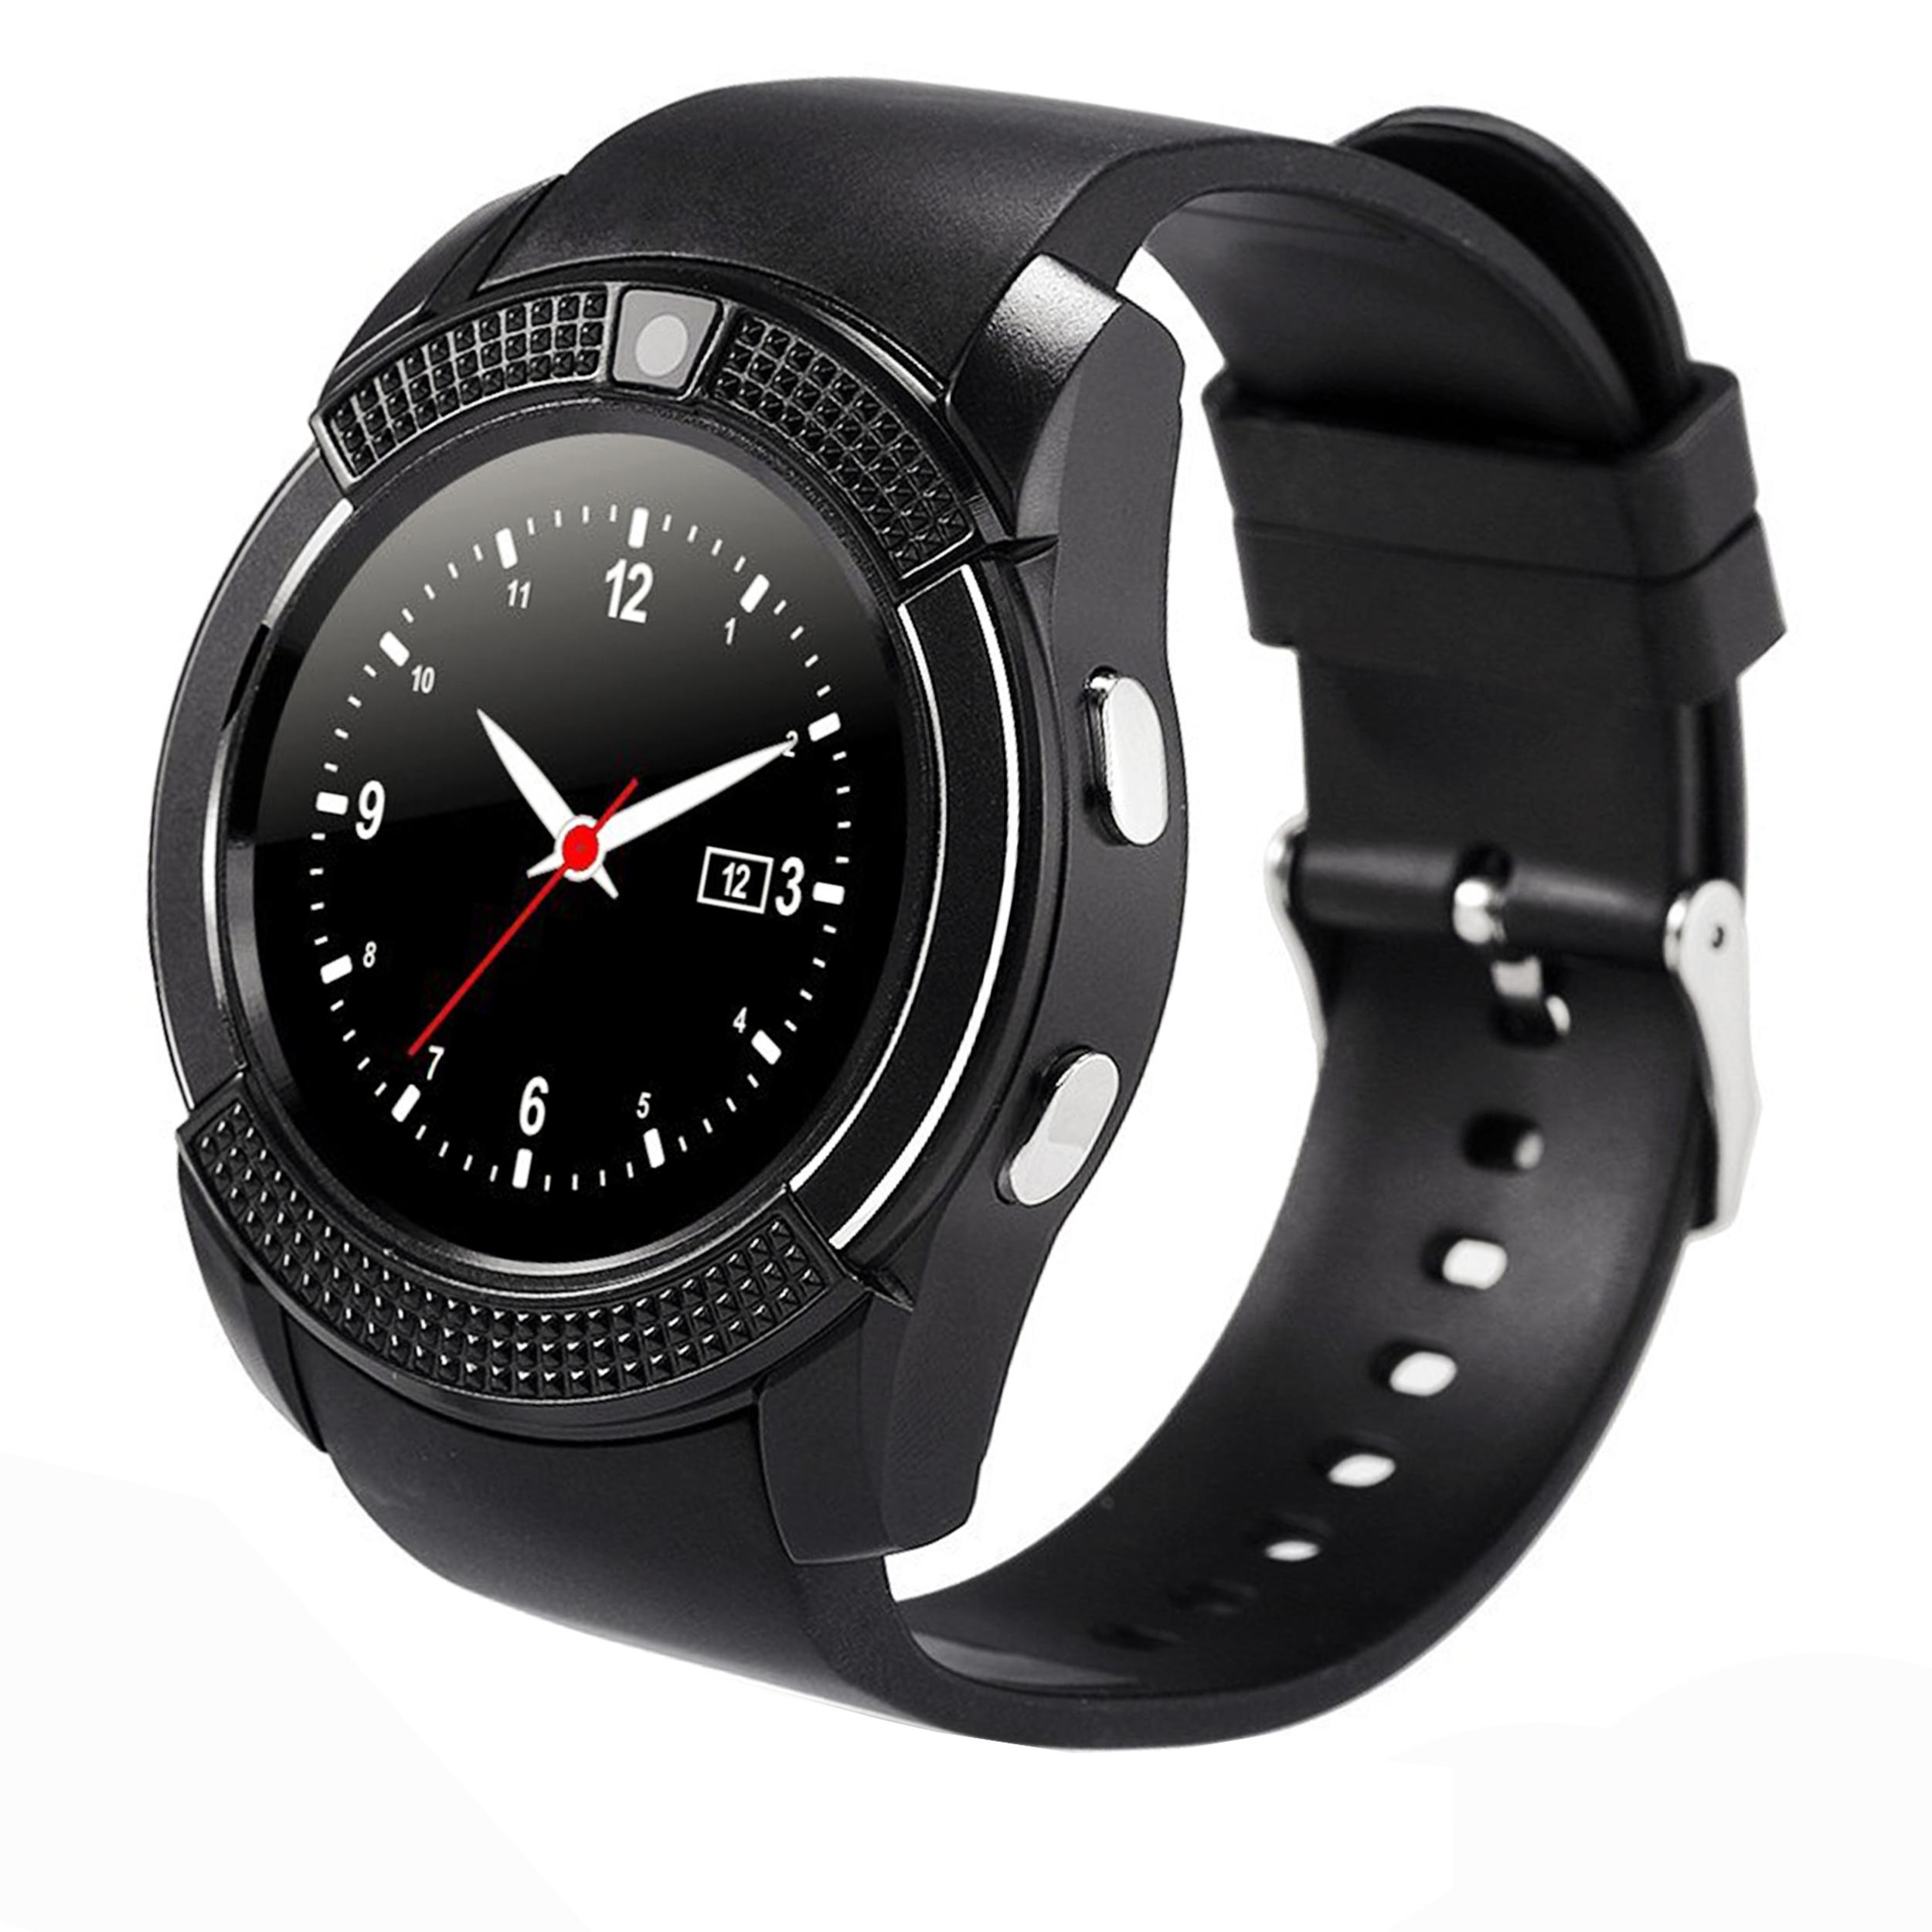 ساعت هوشمند سومگ مدل W300